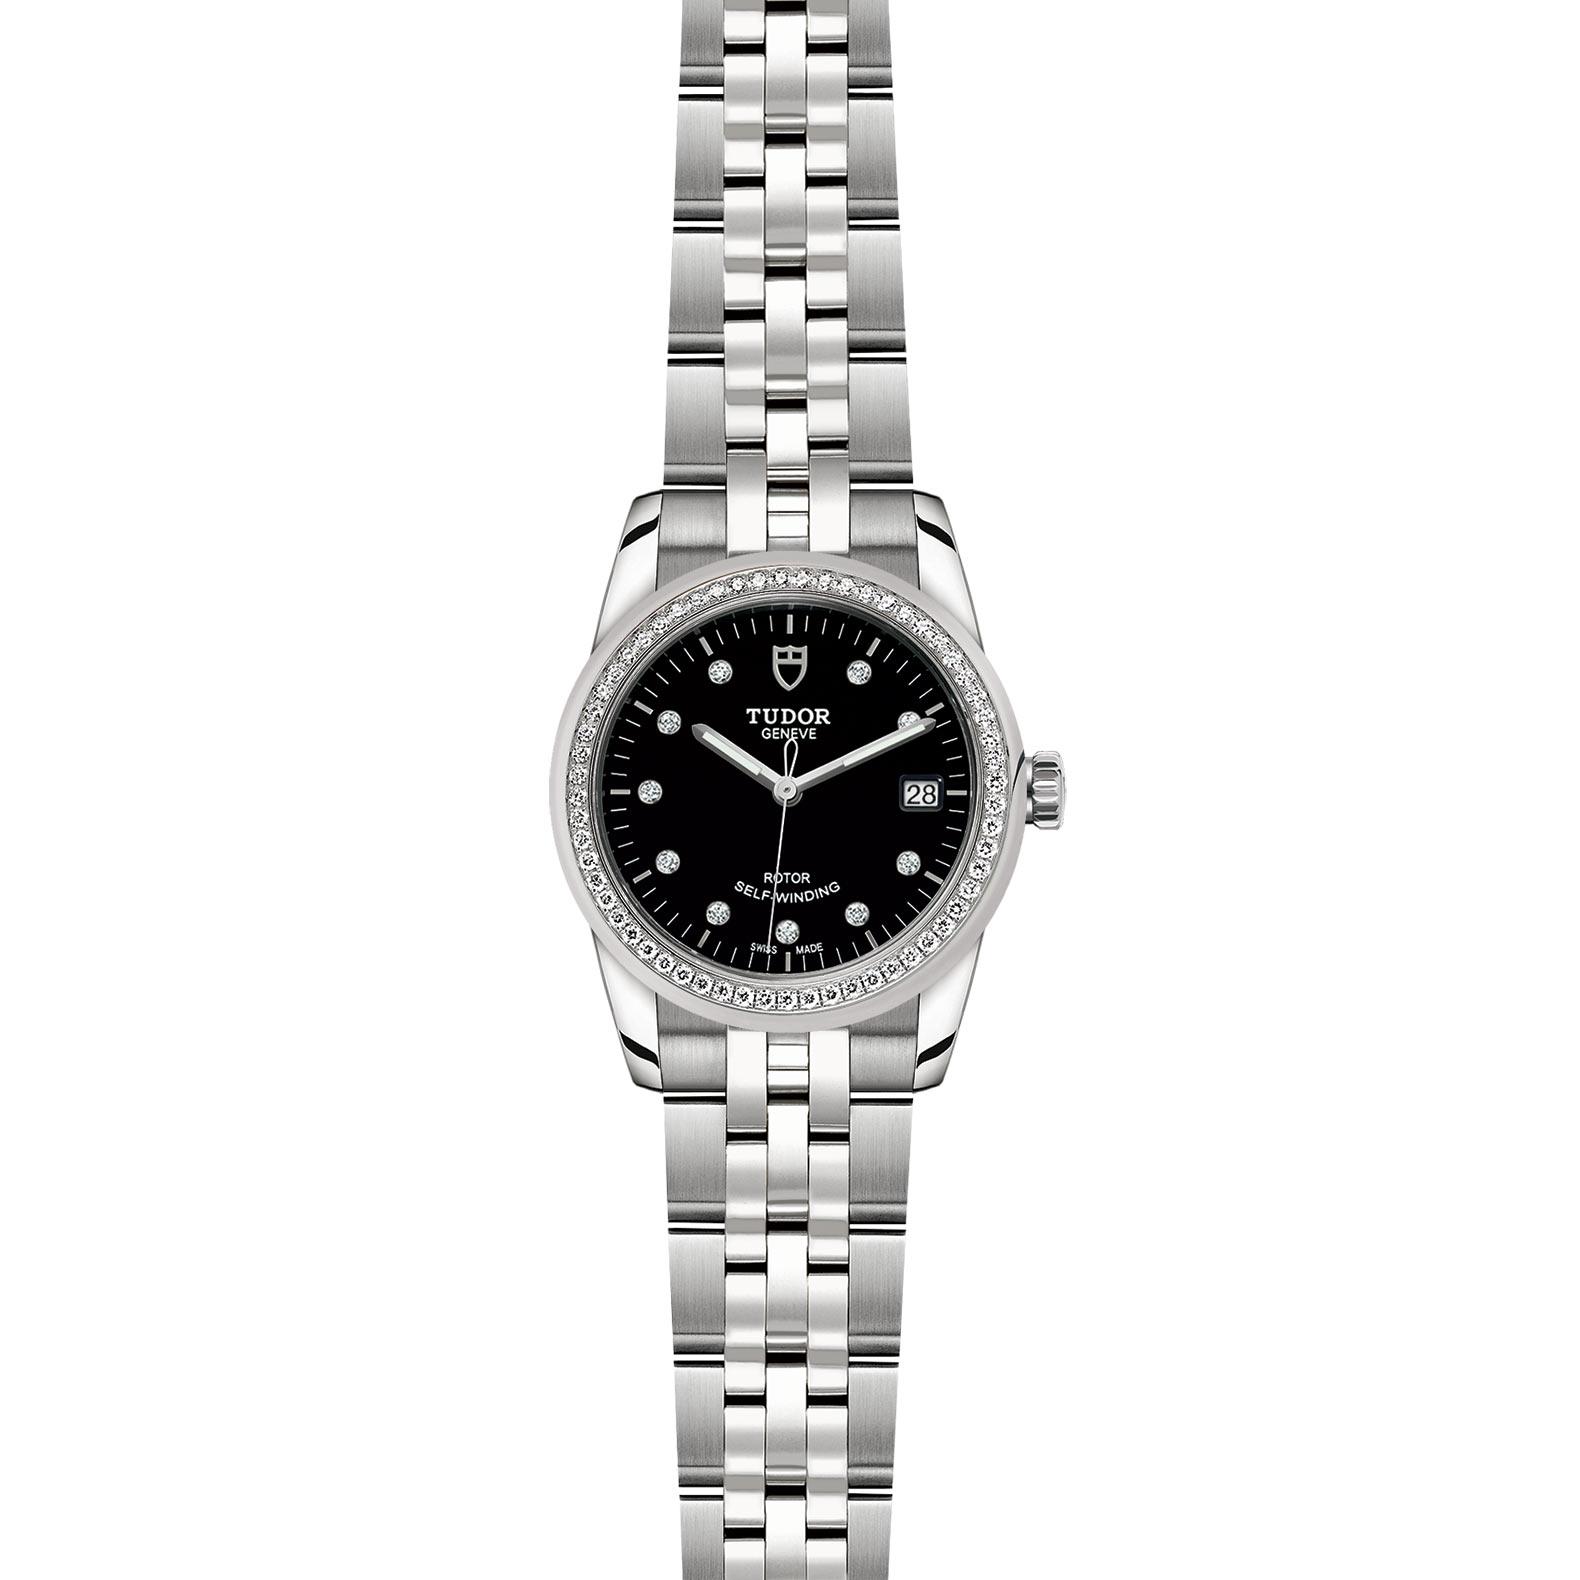 TUDOR Glamour Date M55020 0007 Frontfacing